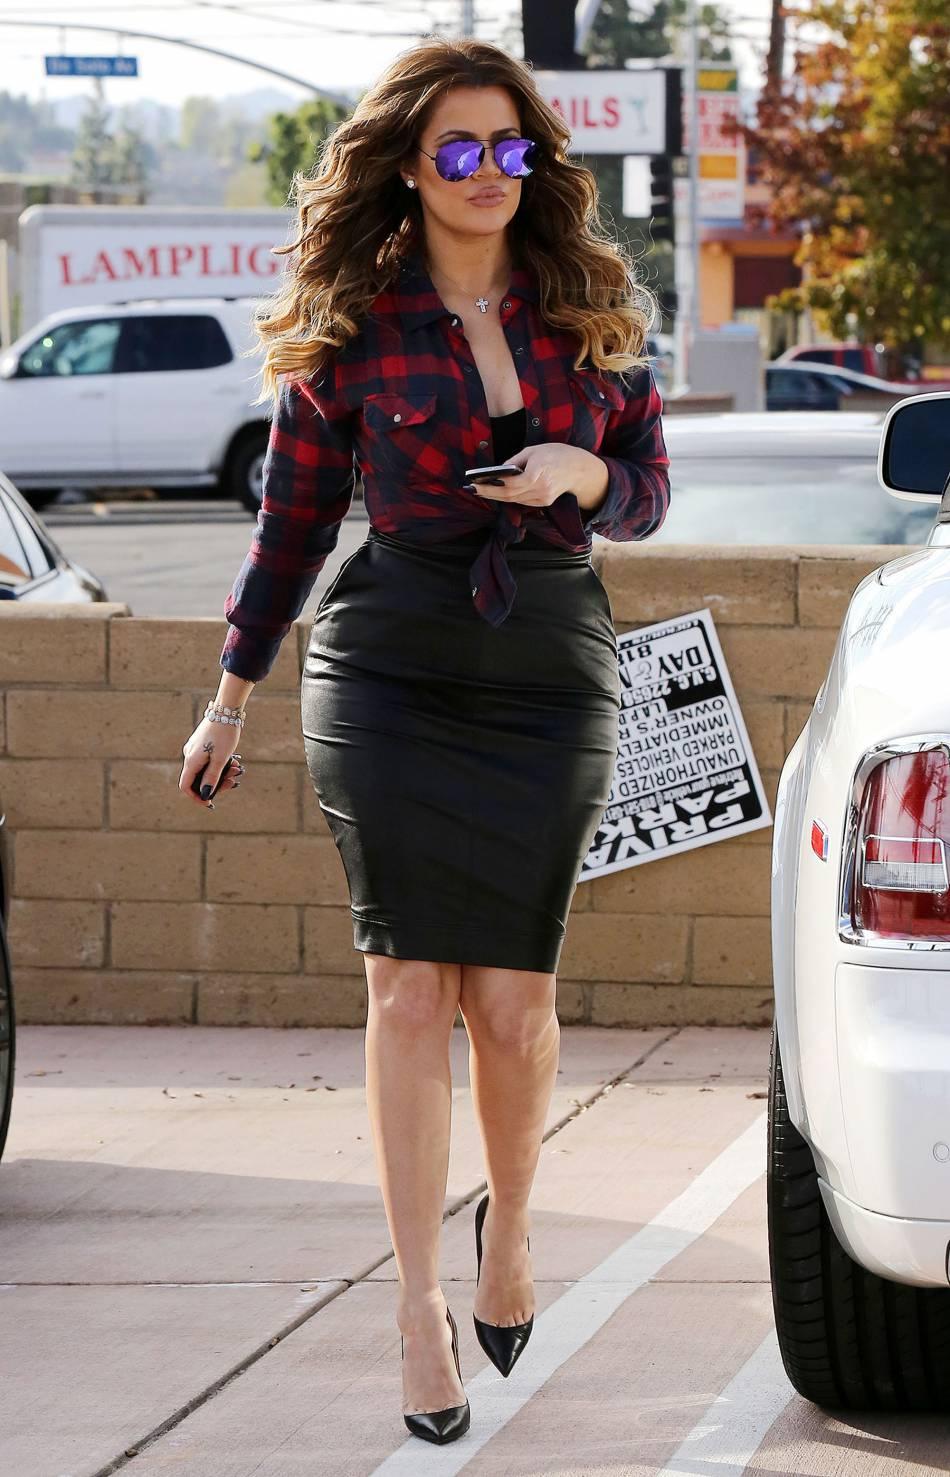 Khloe Kardashian toujours plus hot, elle enchaîne les shootings sexy.